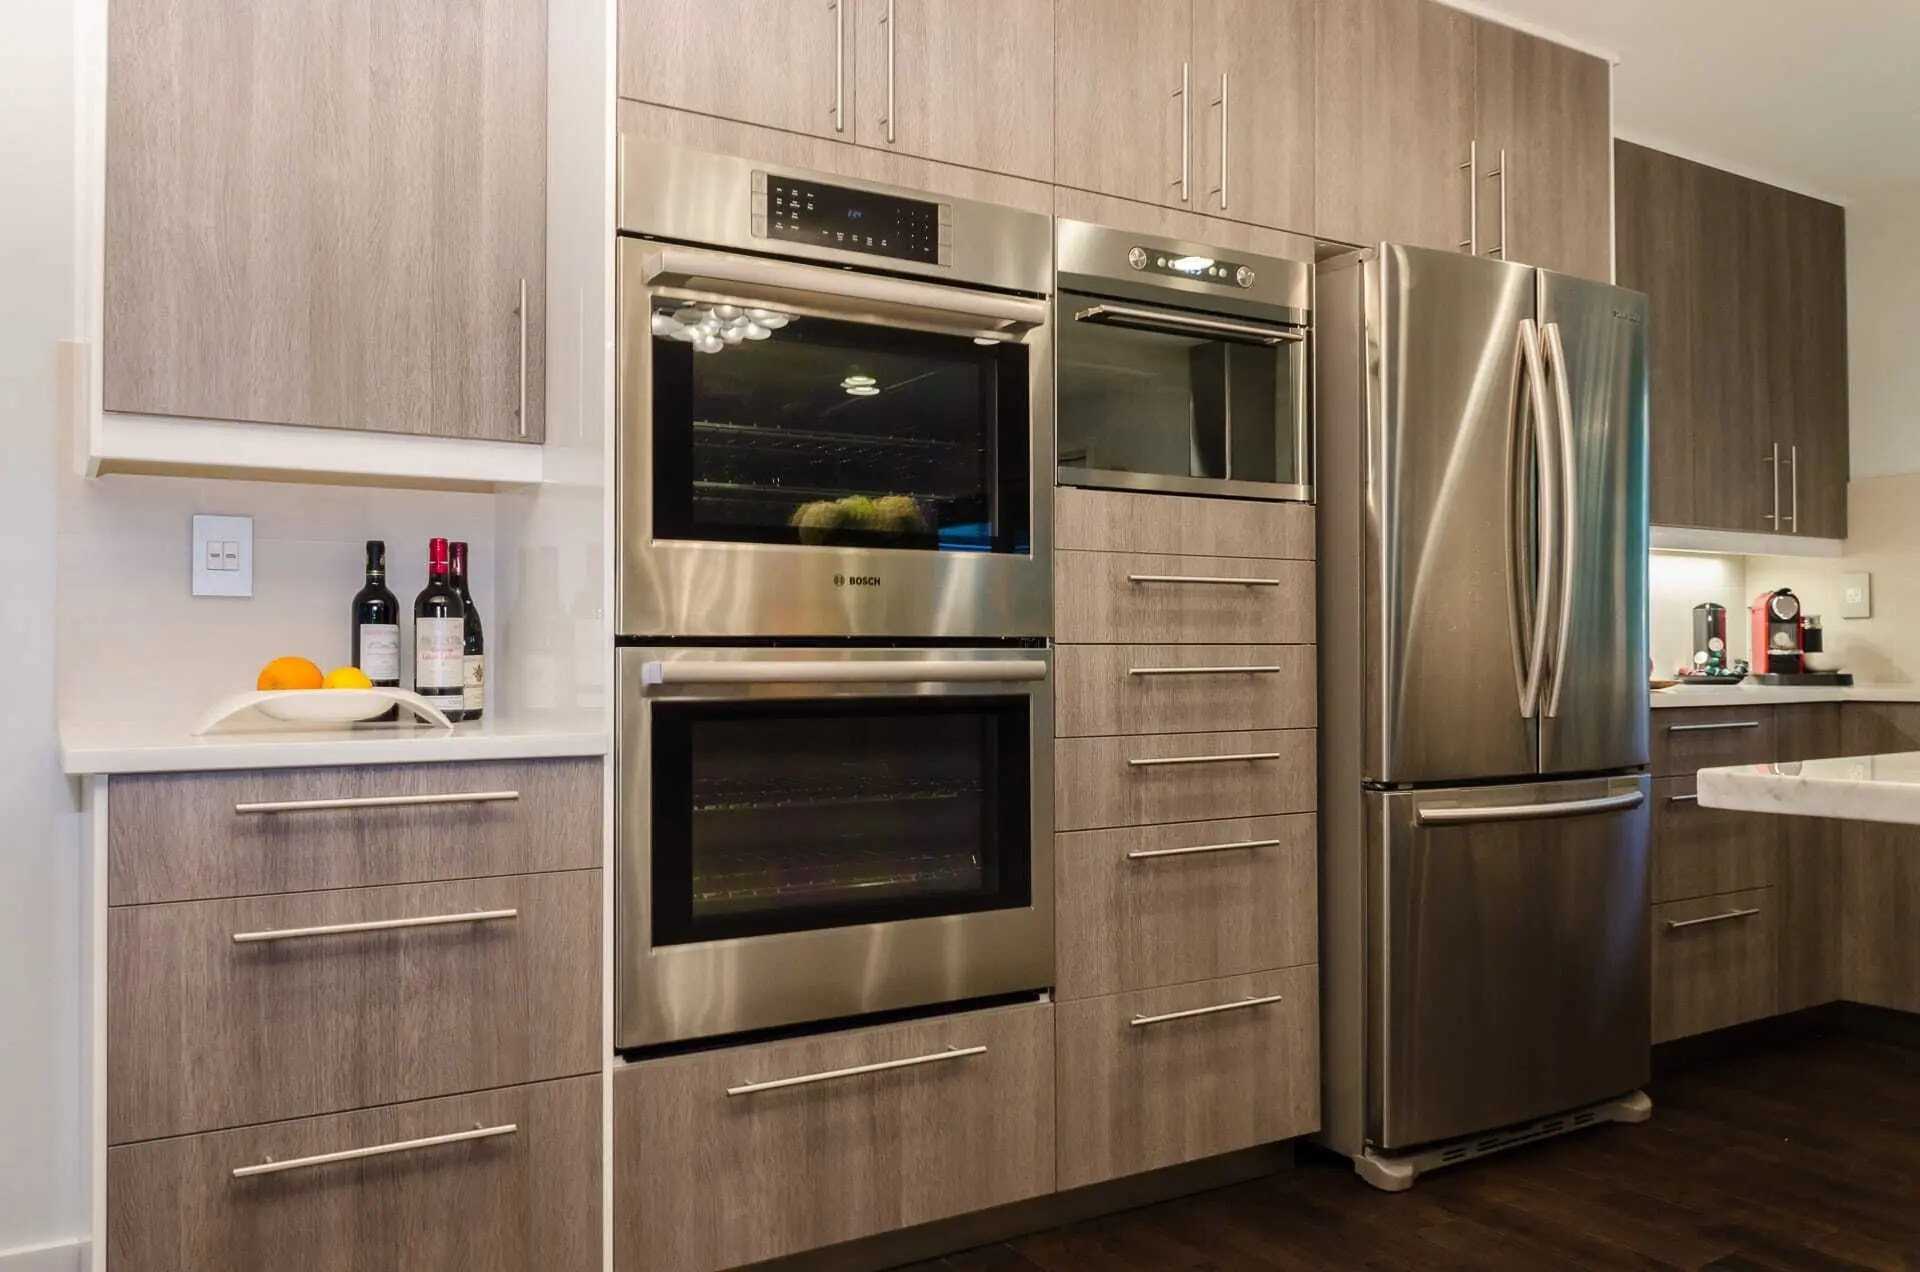 ikea cabinets custom made doors awesome kitchen kitchen cabinets ikea IKEA Cabinets Custom Made Doors Awesome Kitchen